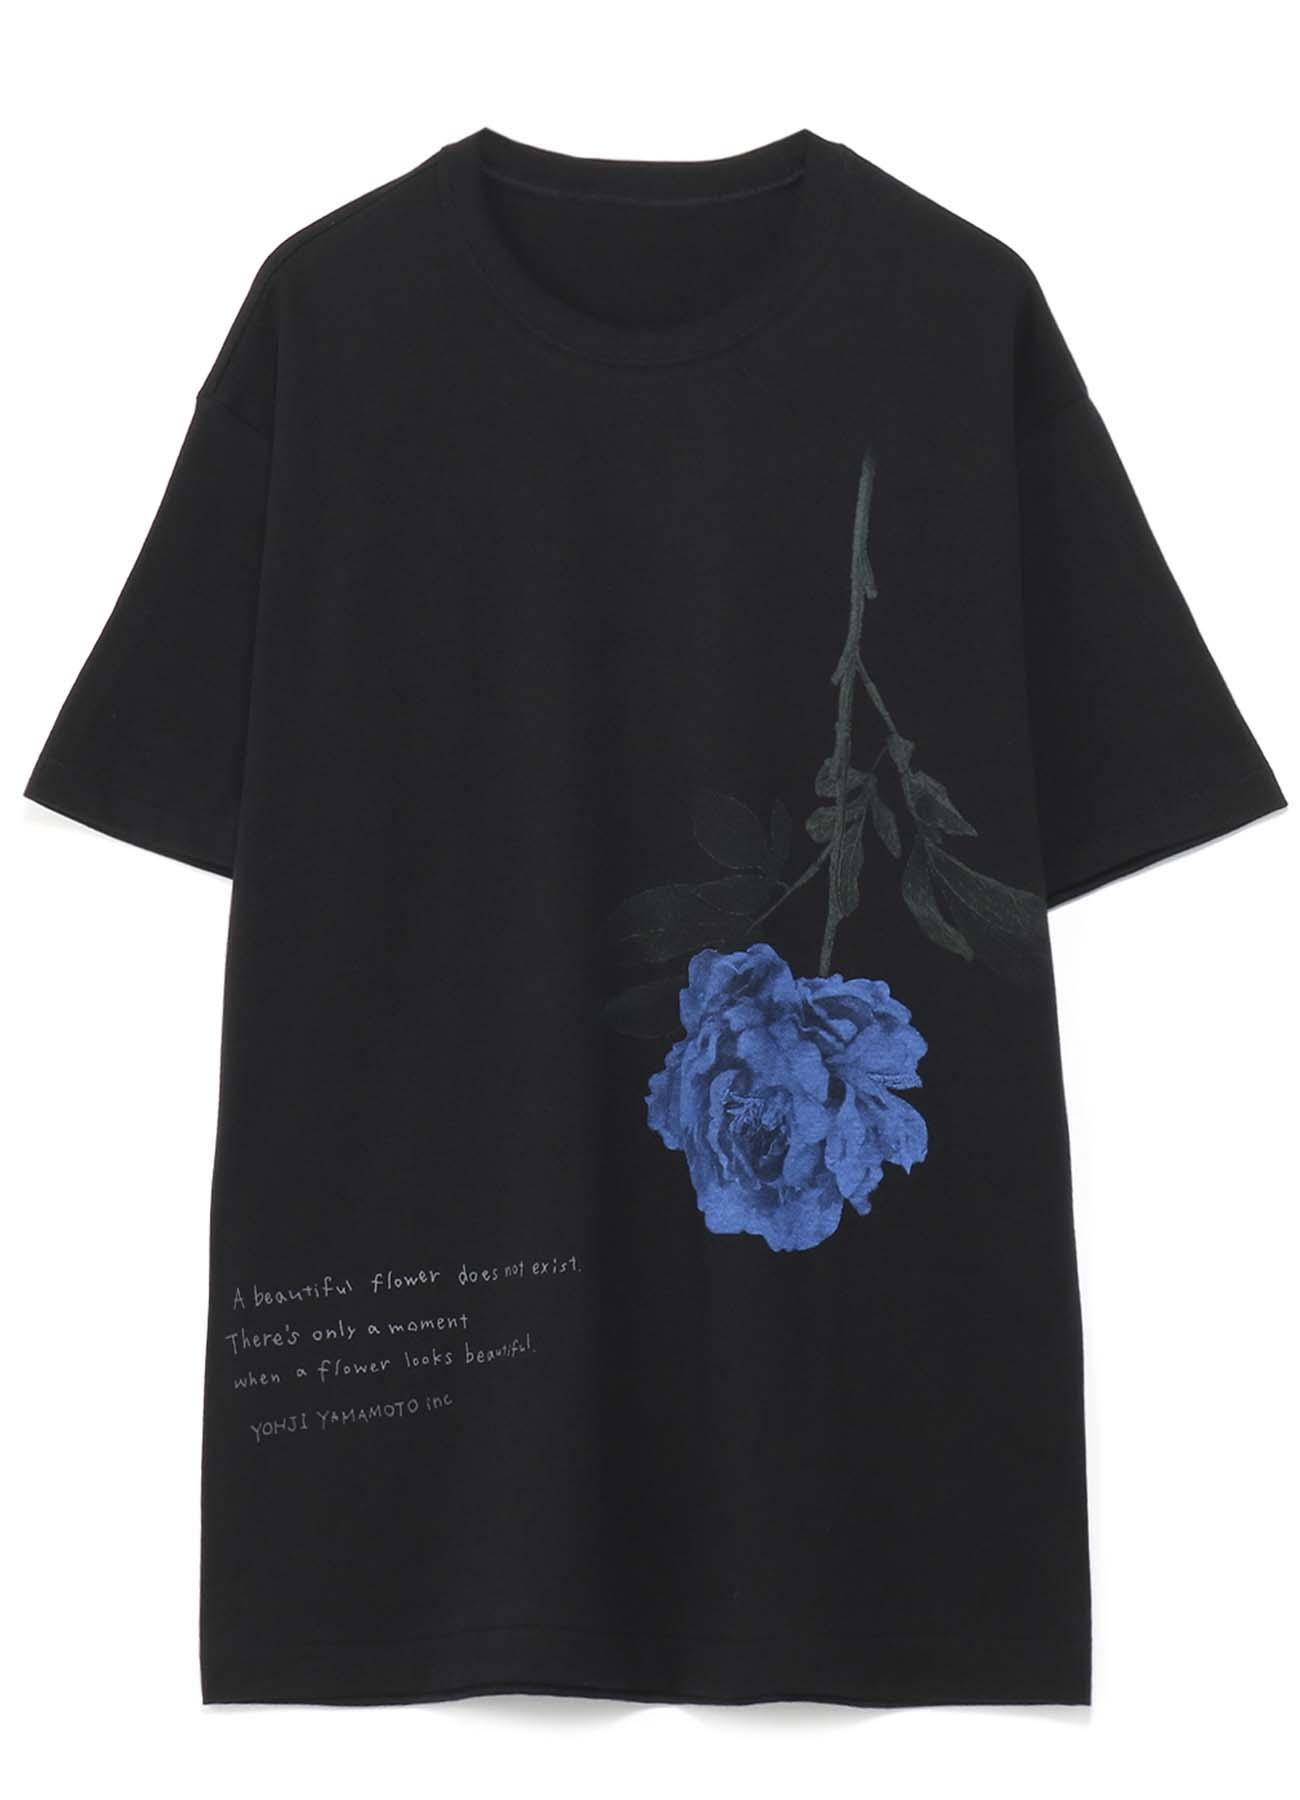 20/CottonJersey Moment When a Flower Looks Beautiful T-Shirt